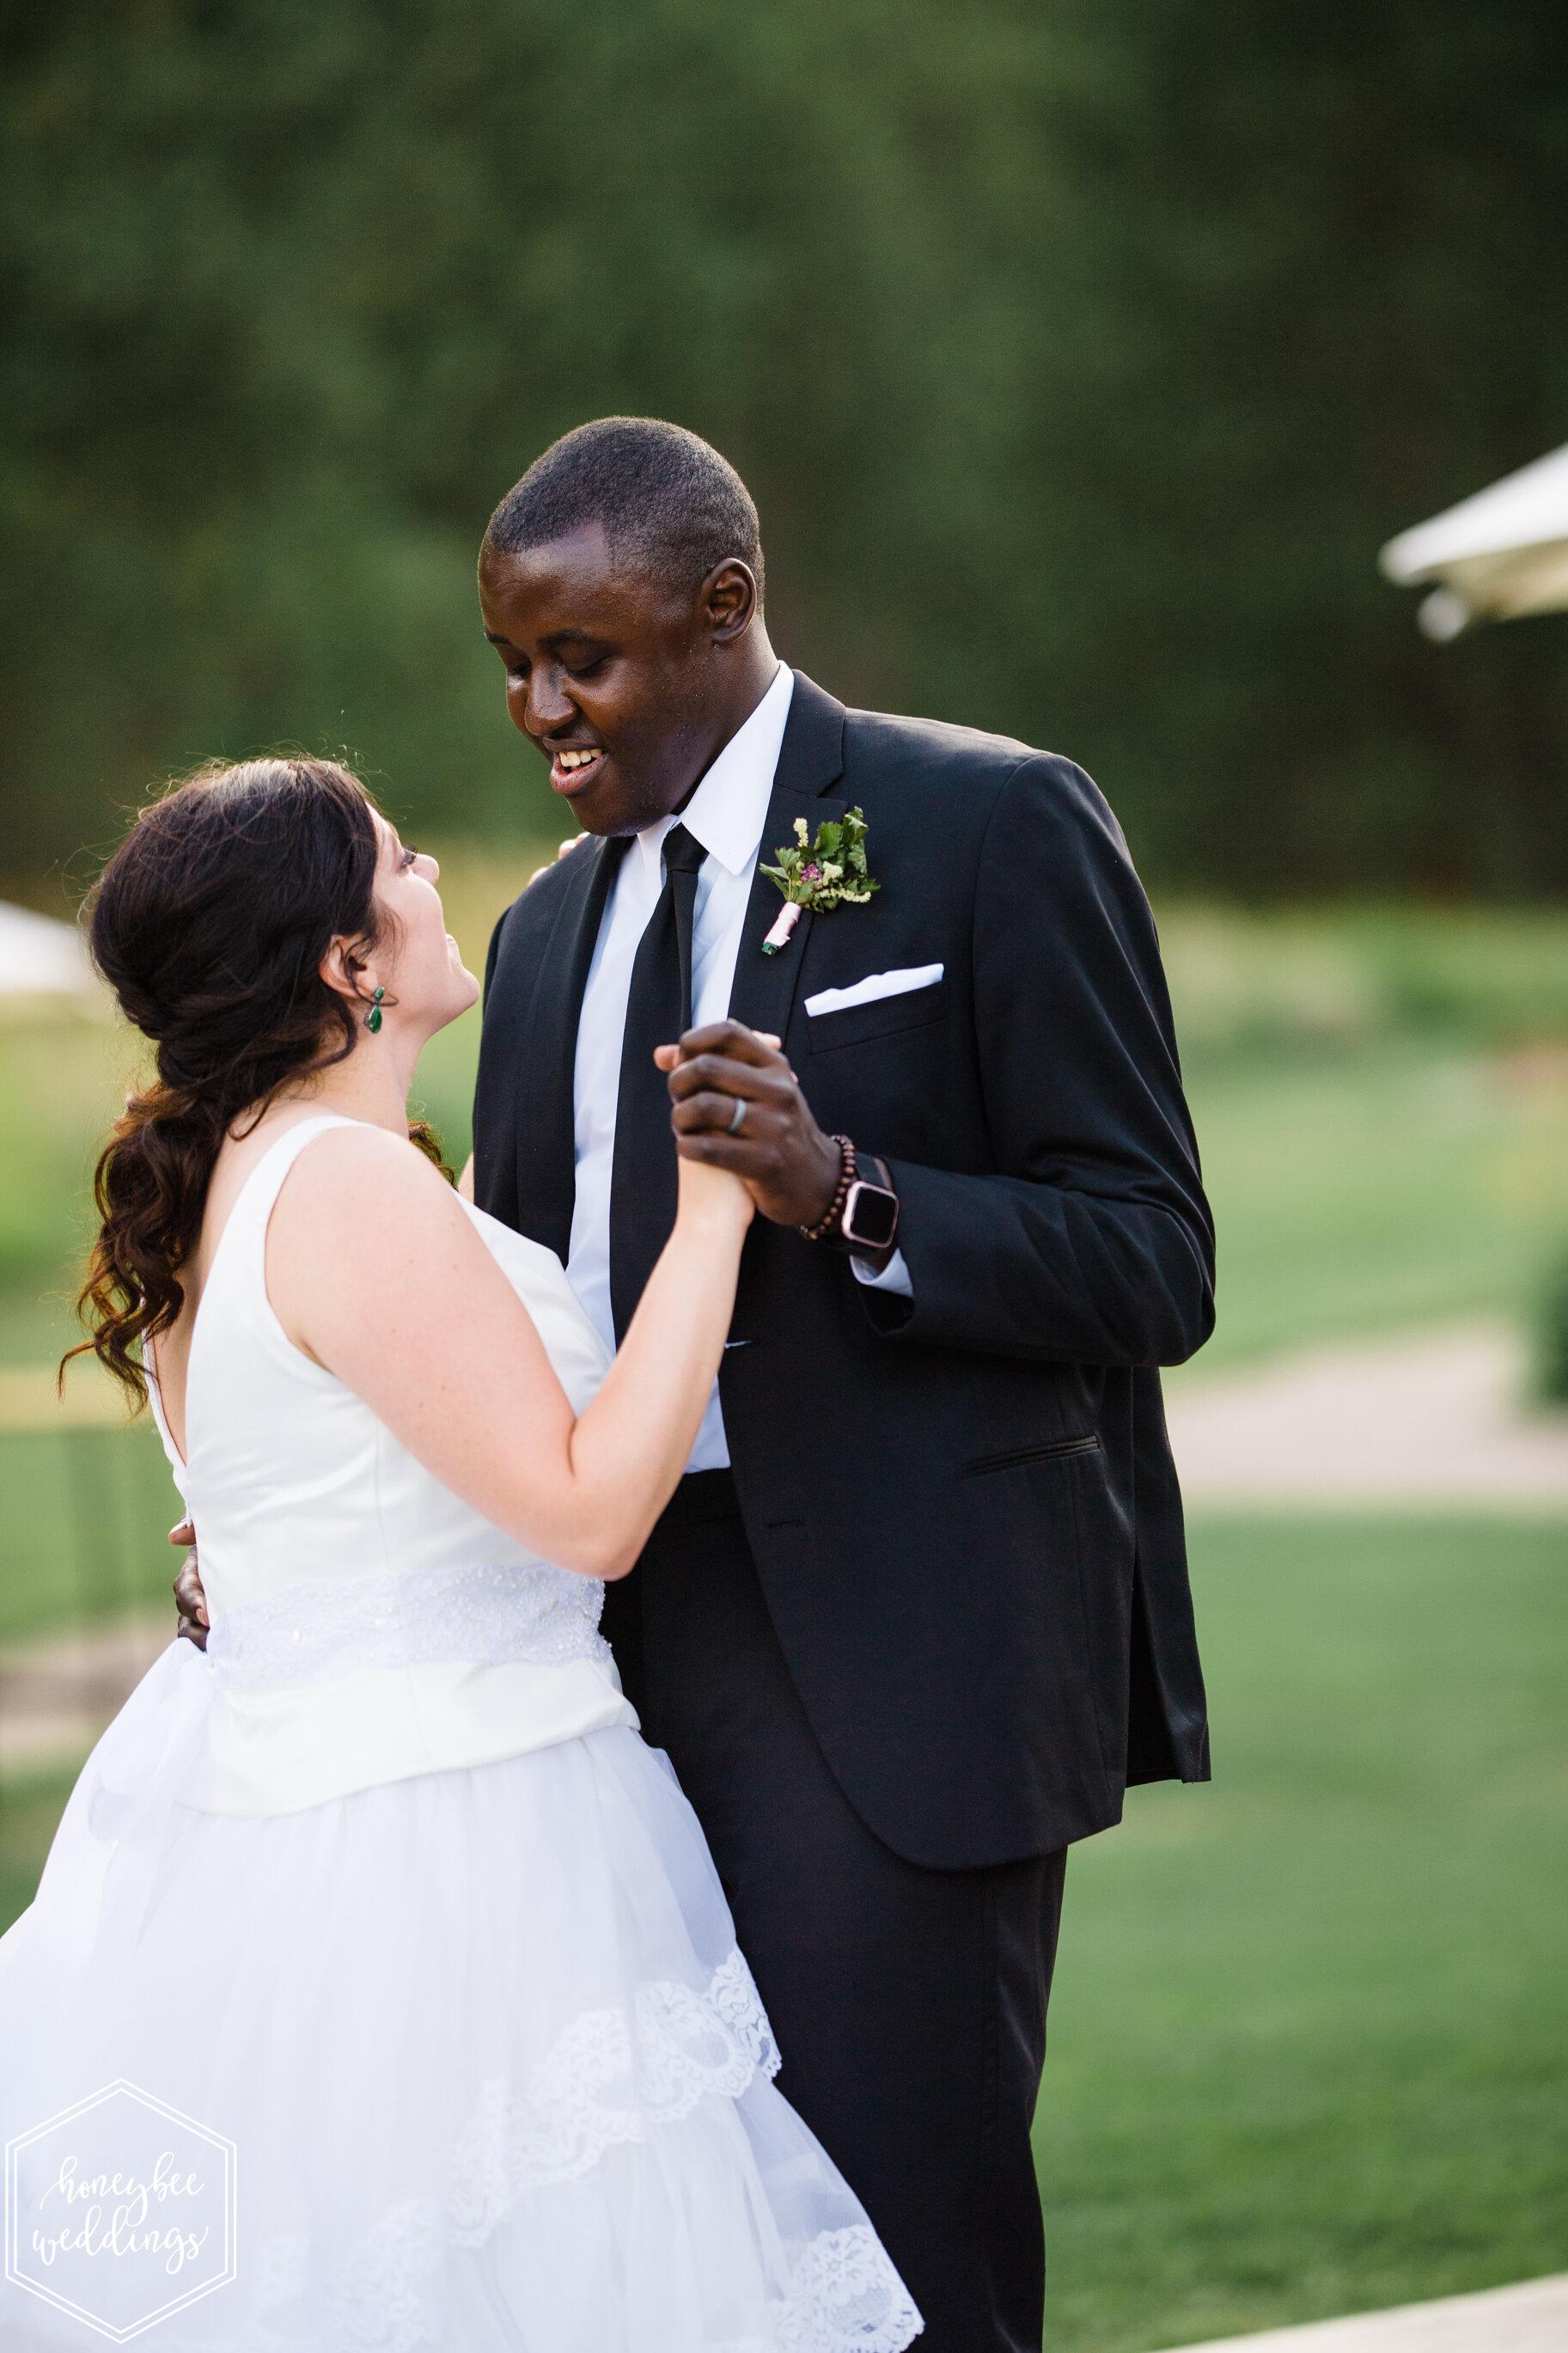 154White Raven Wedding_Montana Wedding Photographer_Rebekah & Likom_Honeybee Weddings_July 27, 2019-1434.jpg